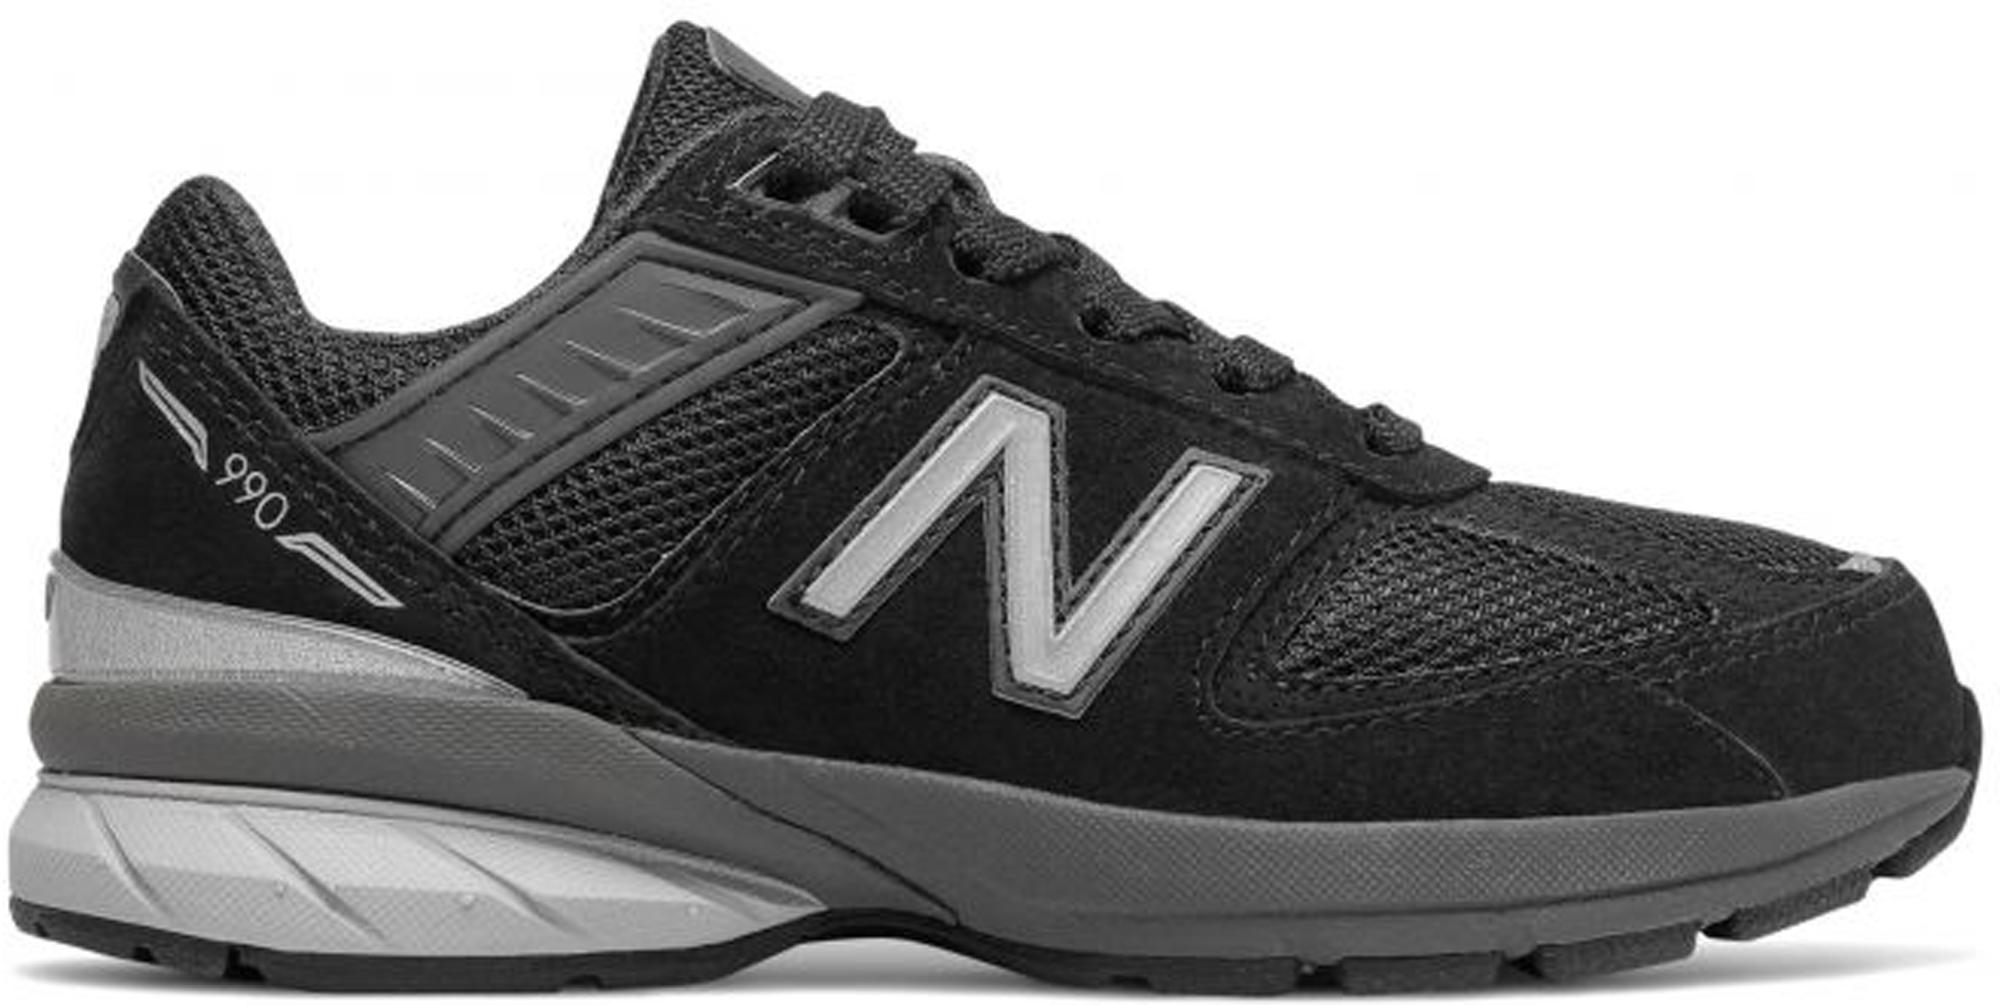 New Balance 990 v5 Black (PS) - PC990BK5